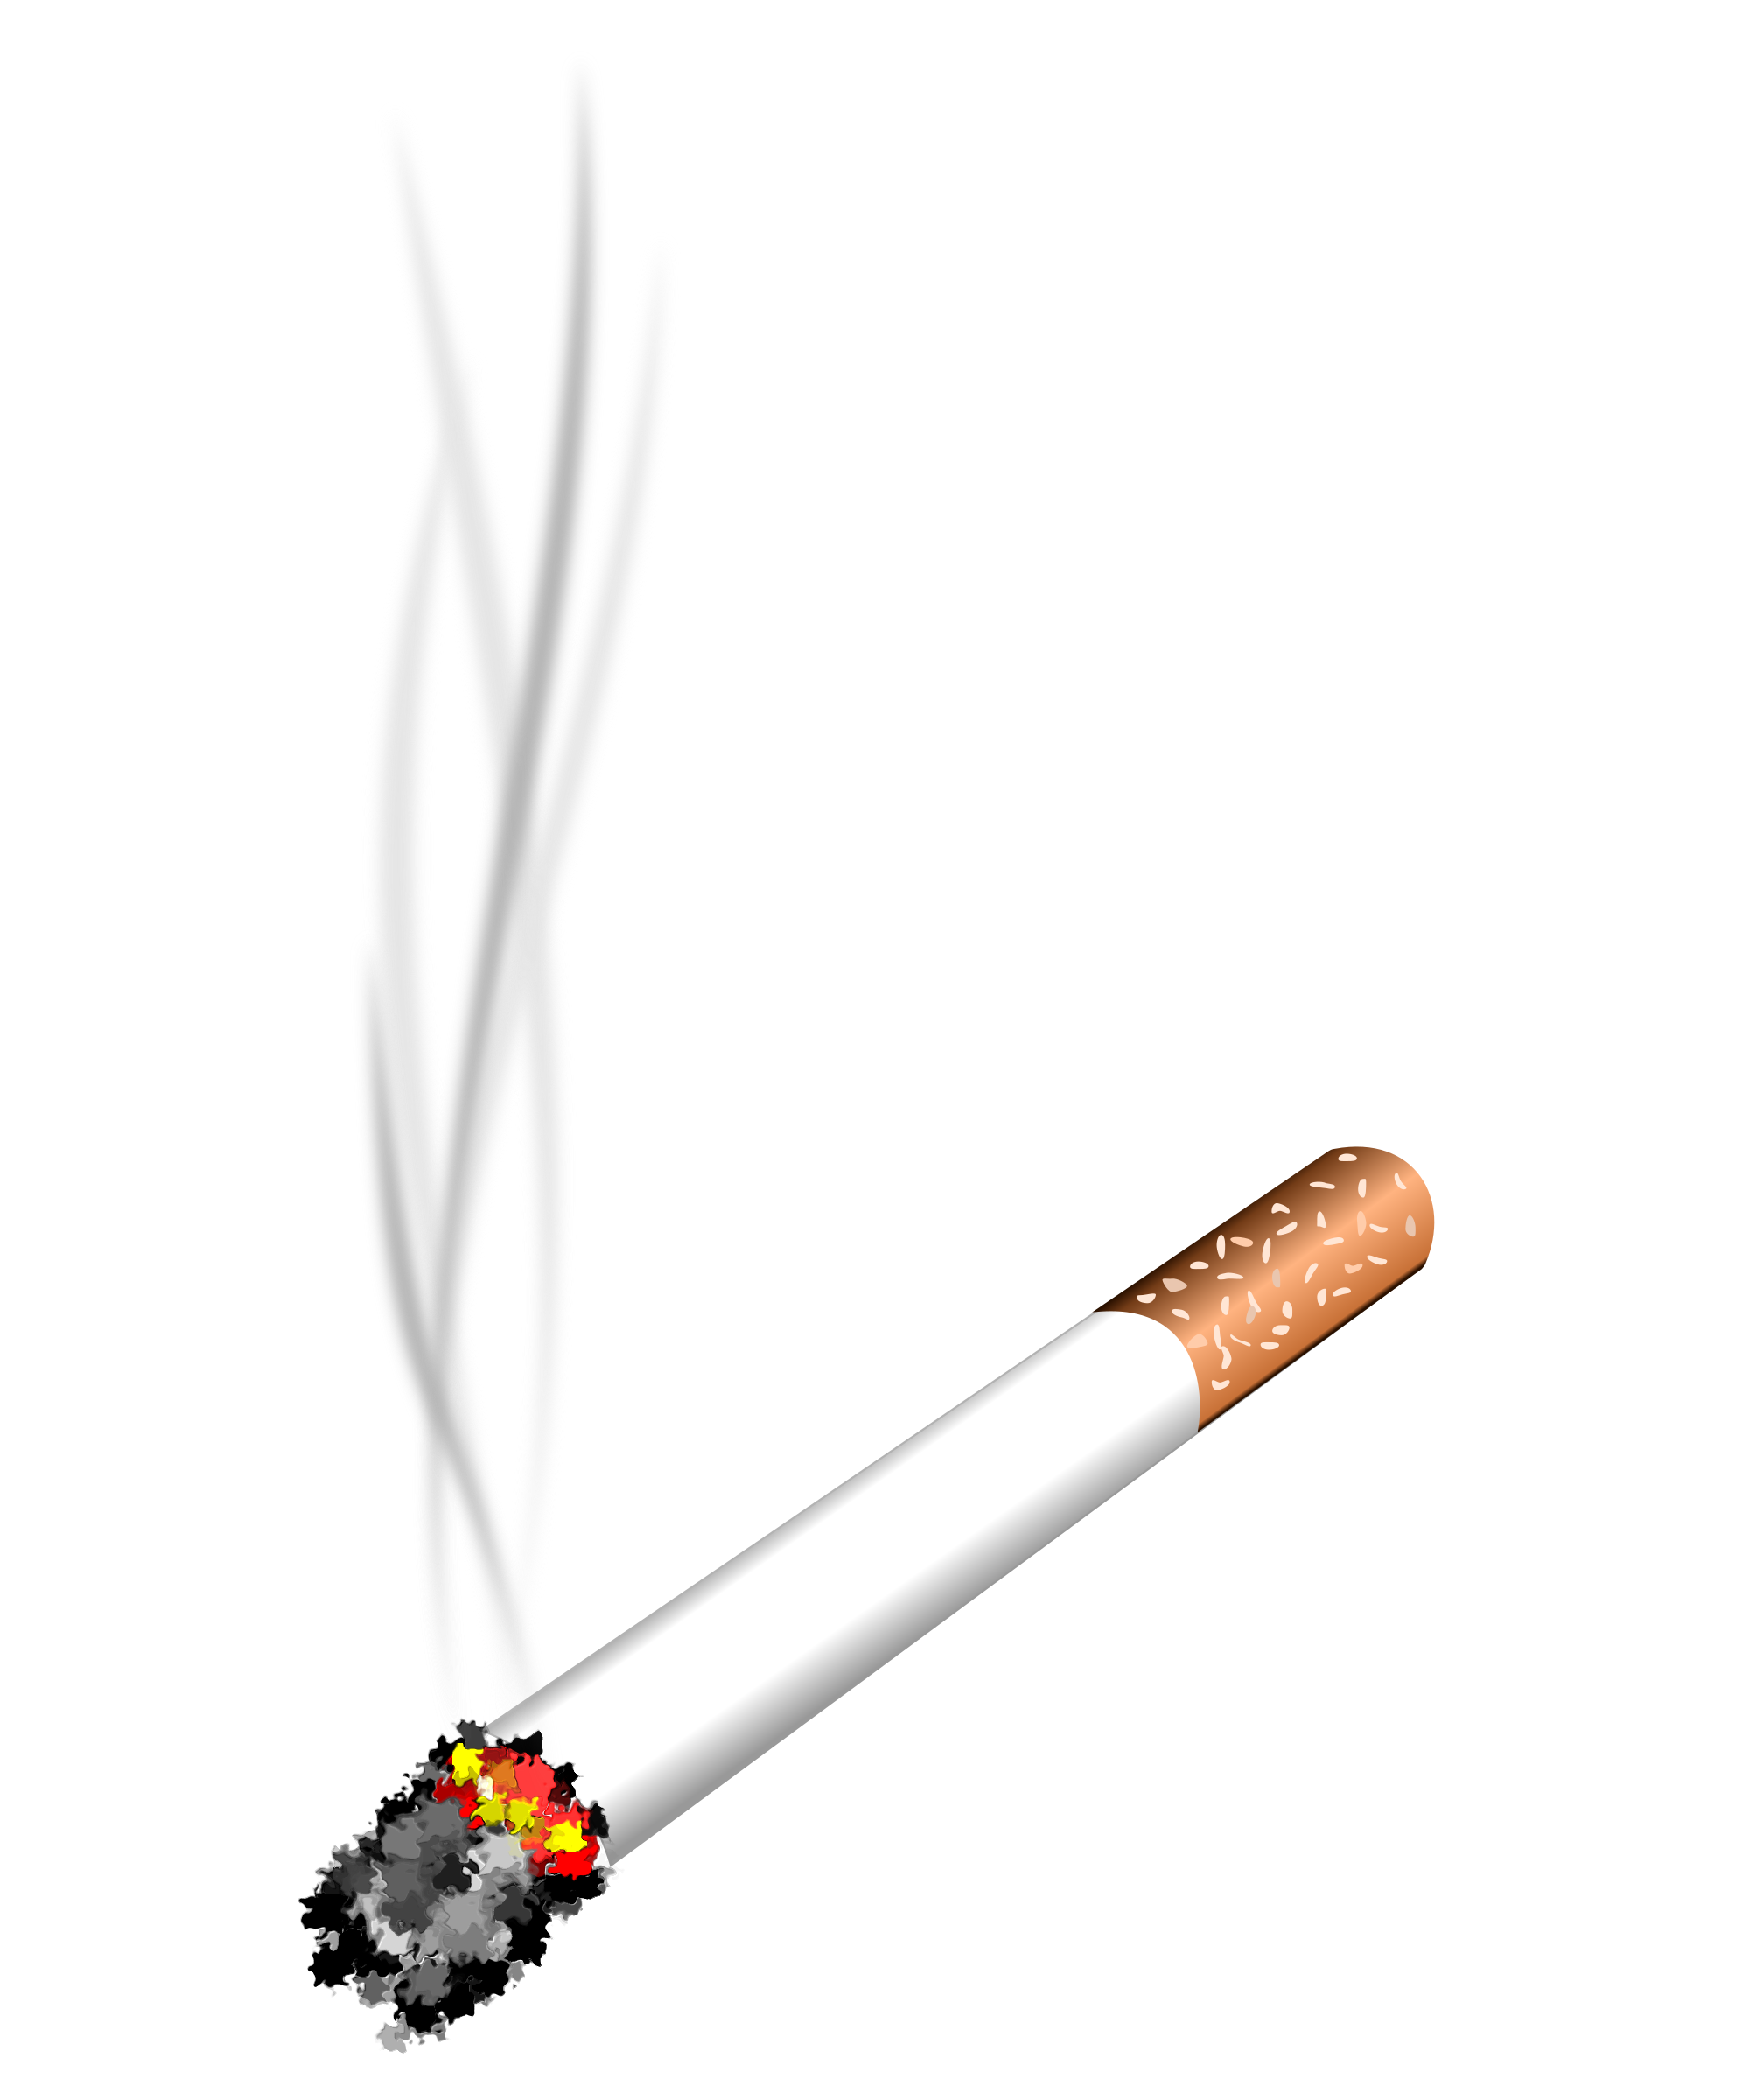 Drawn cigarette transparent background #14